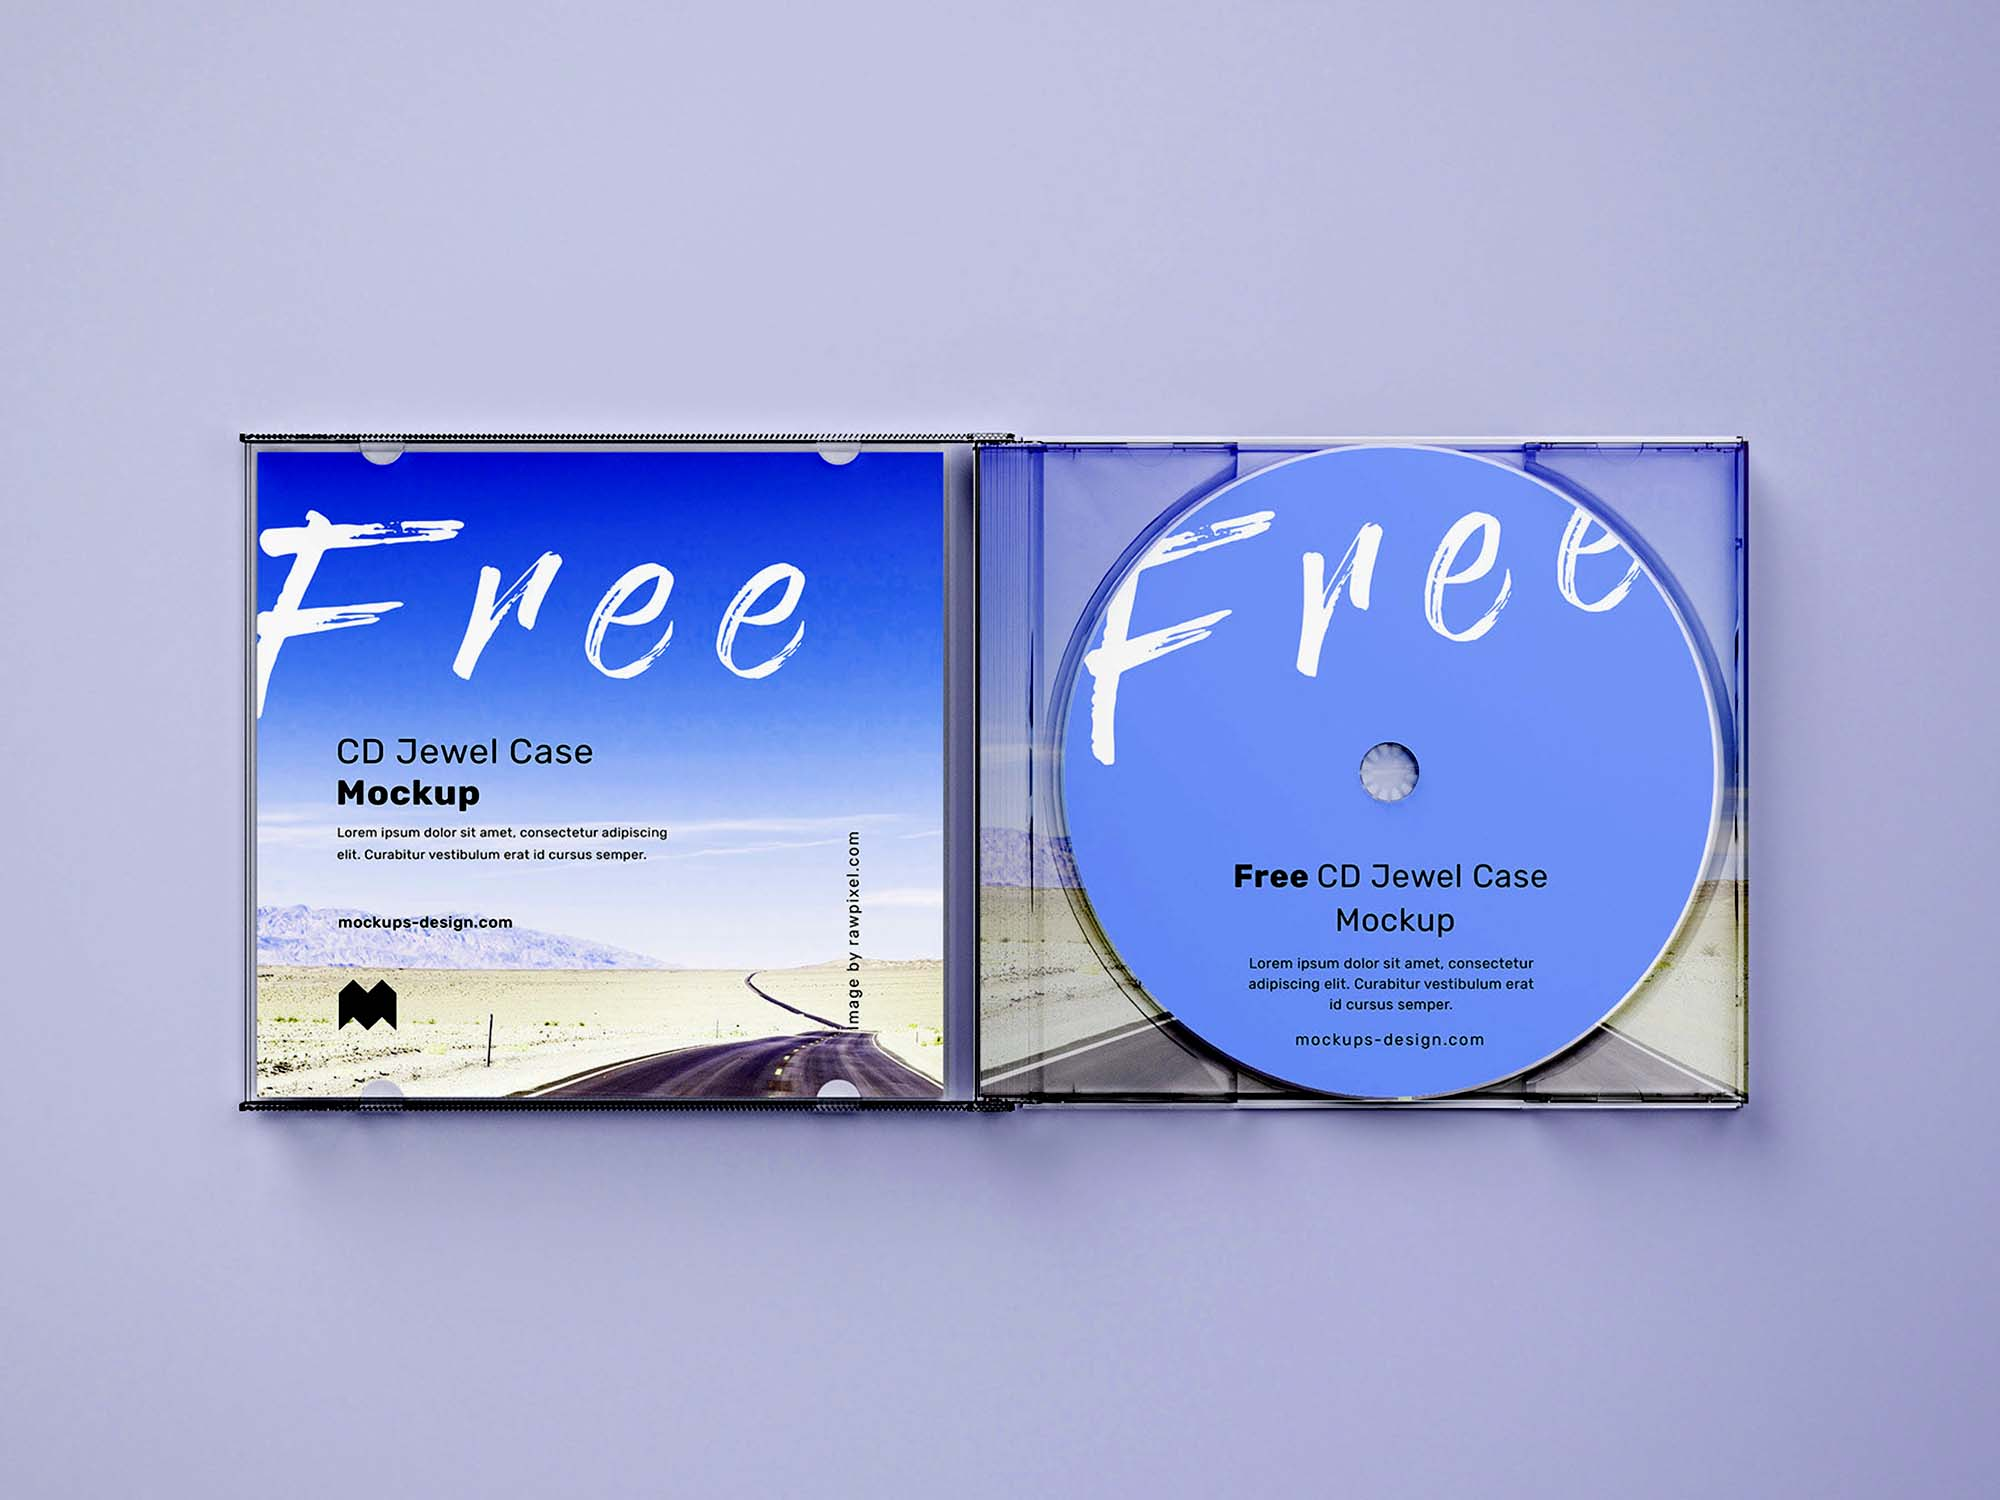 CD Jewel Case Mockup 5